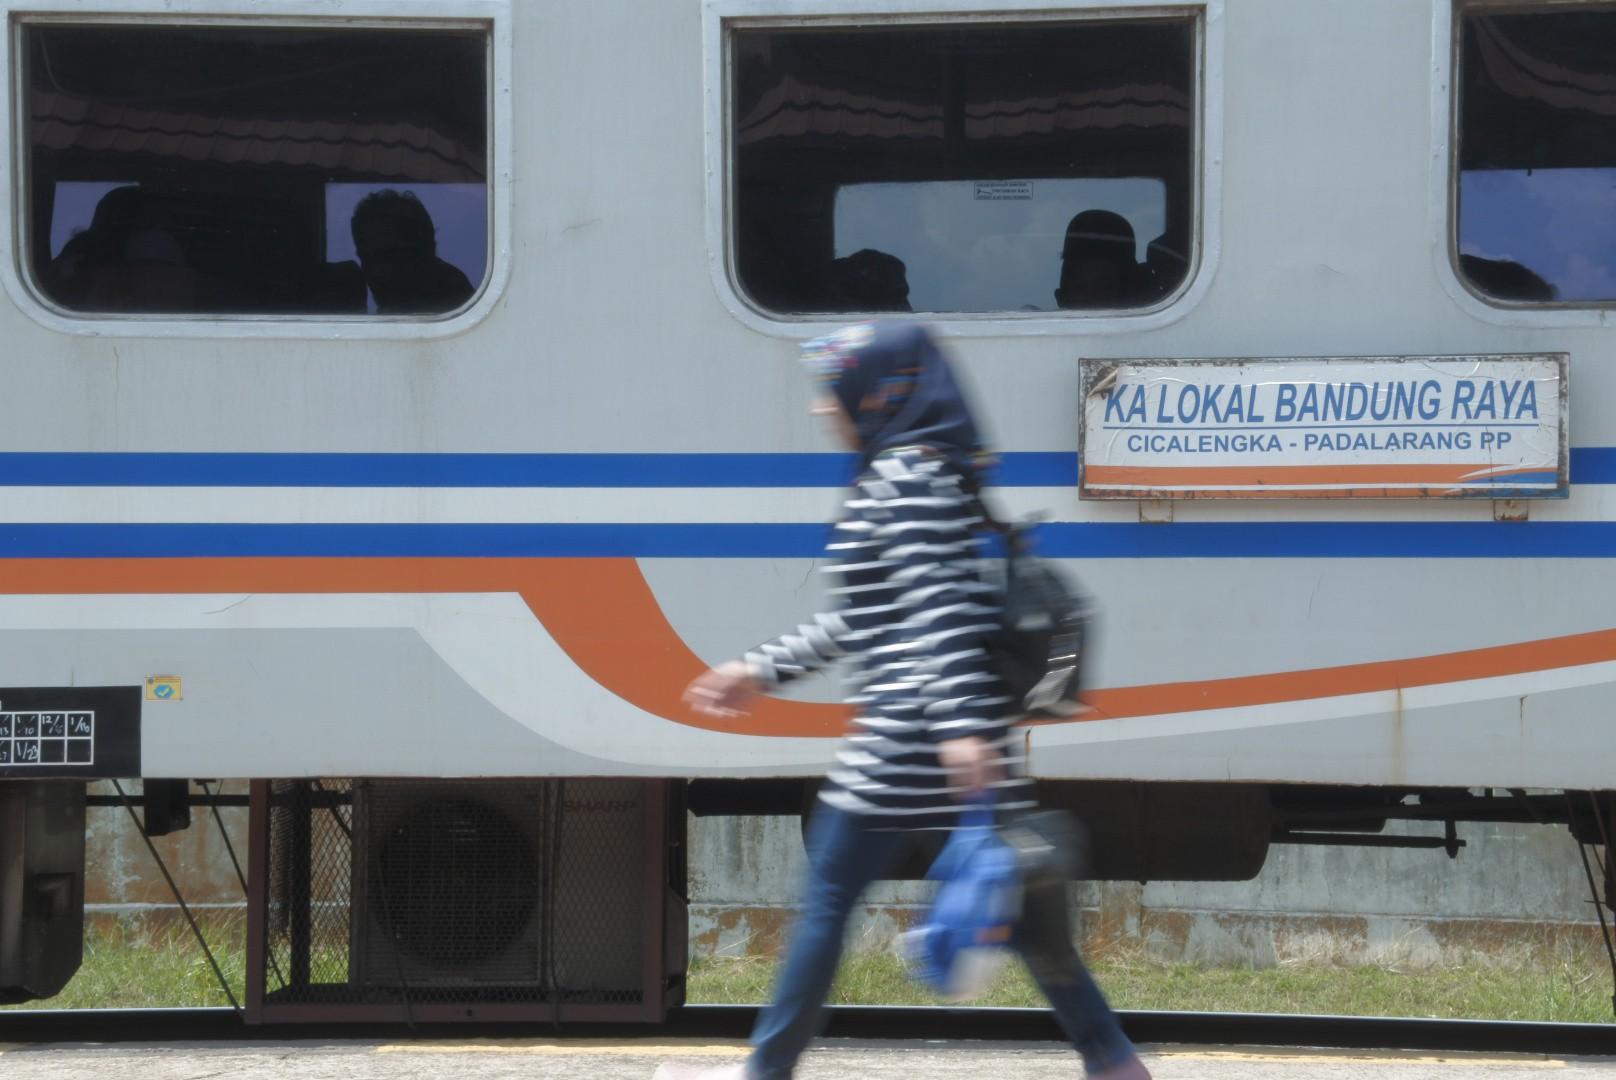 [FOTO] Suasana Stasiun Cimekar Kota Bandung